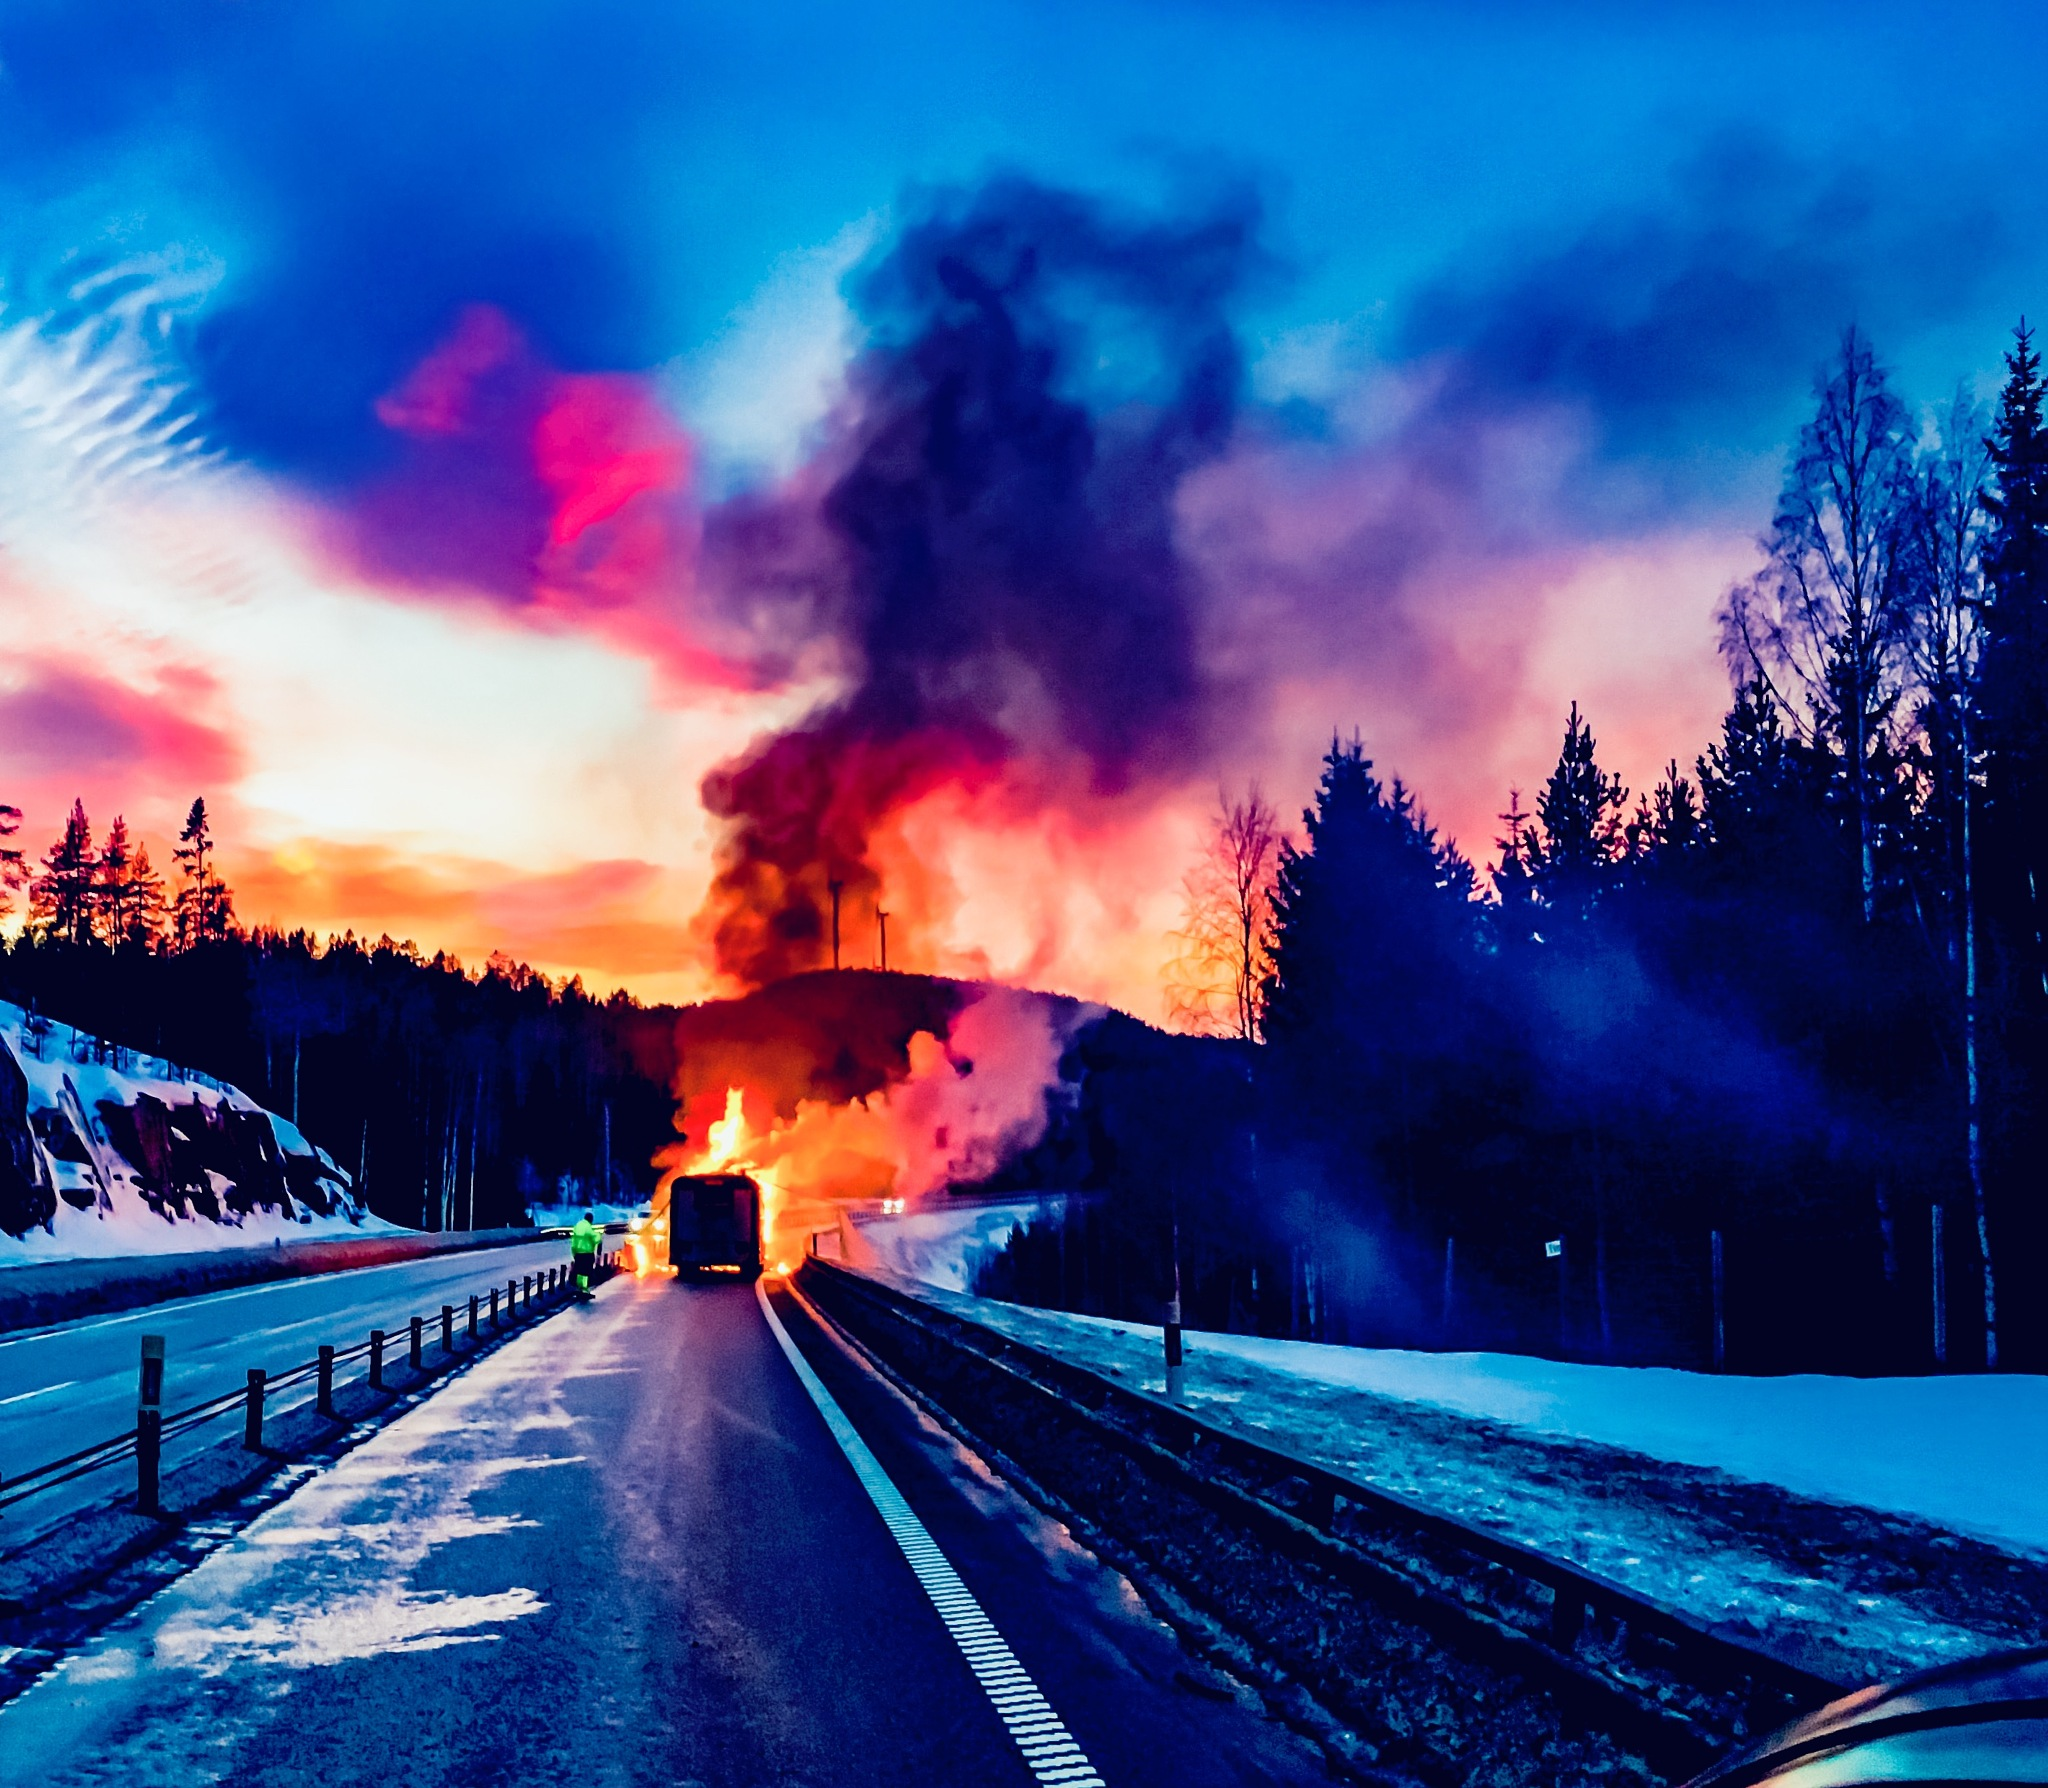 Bus burned down  by Robert Grundel